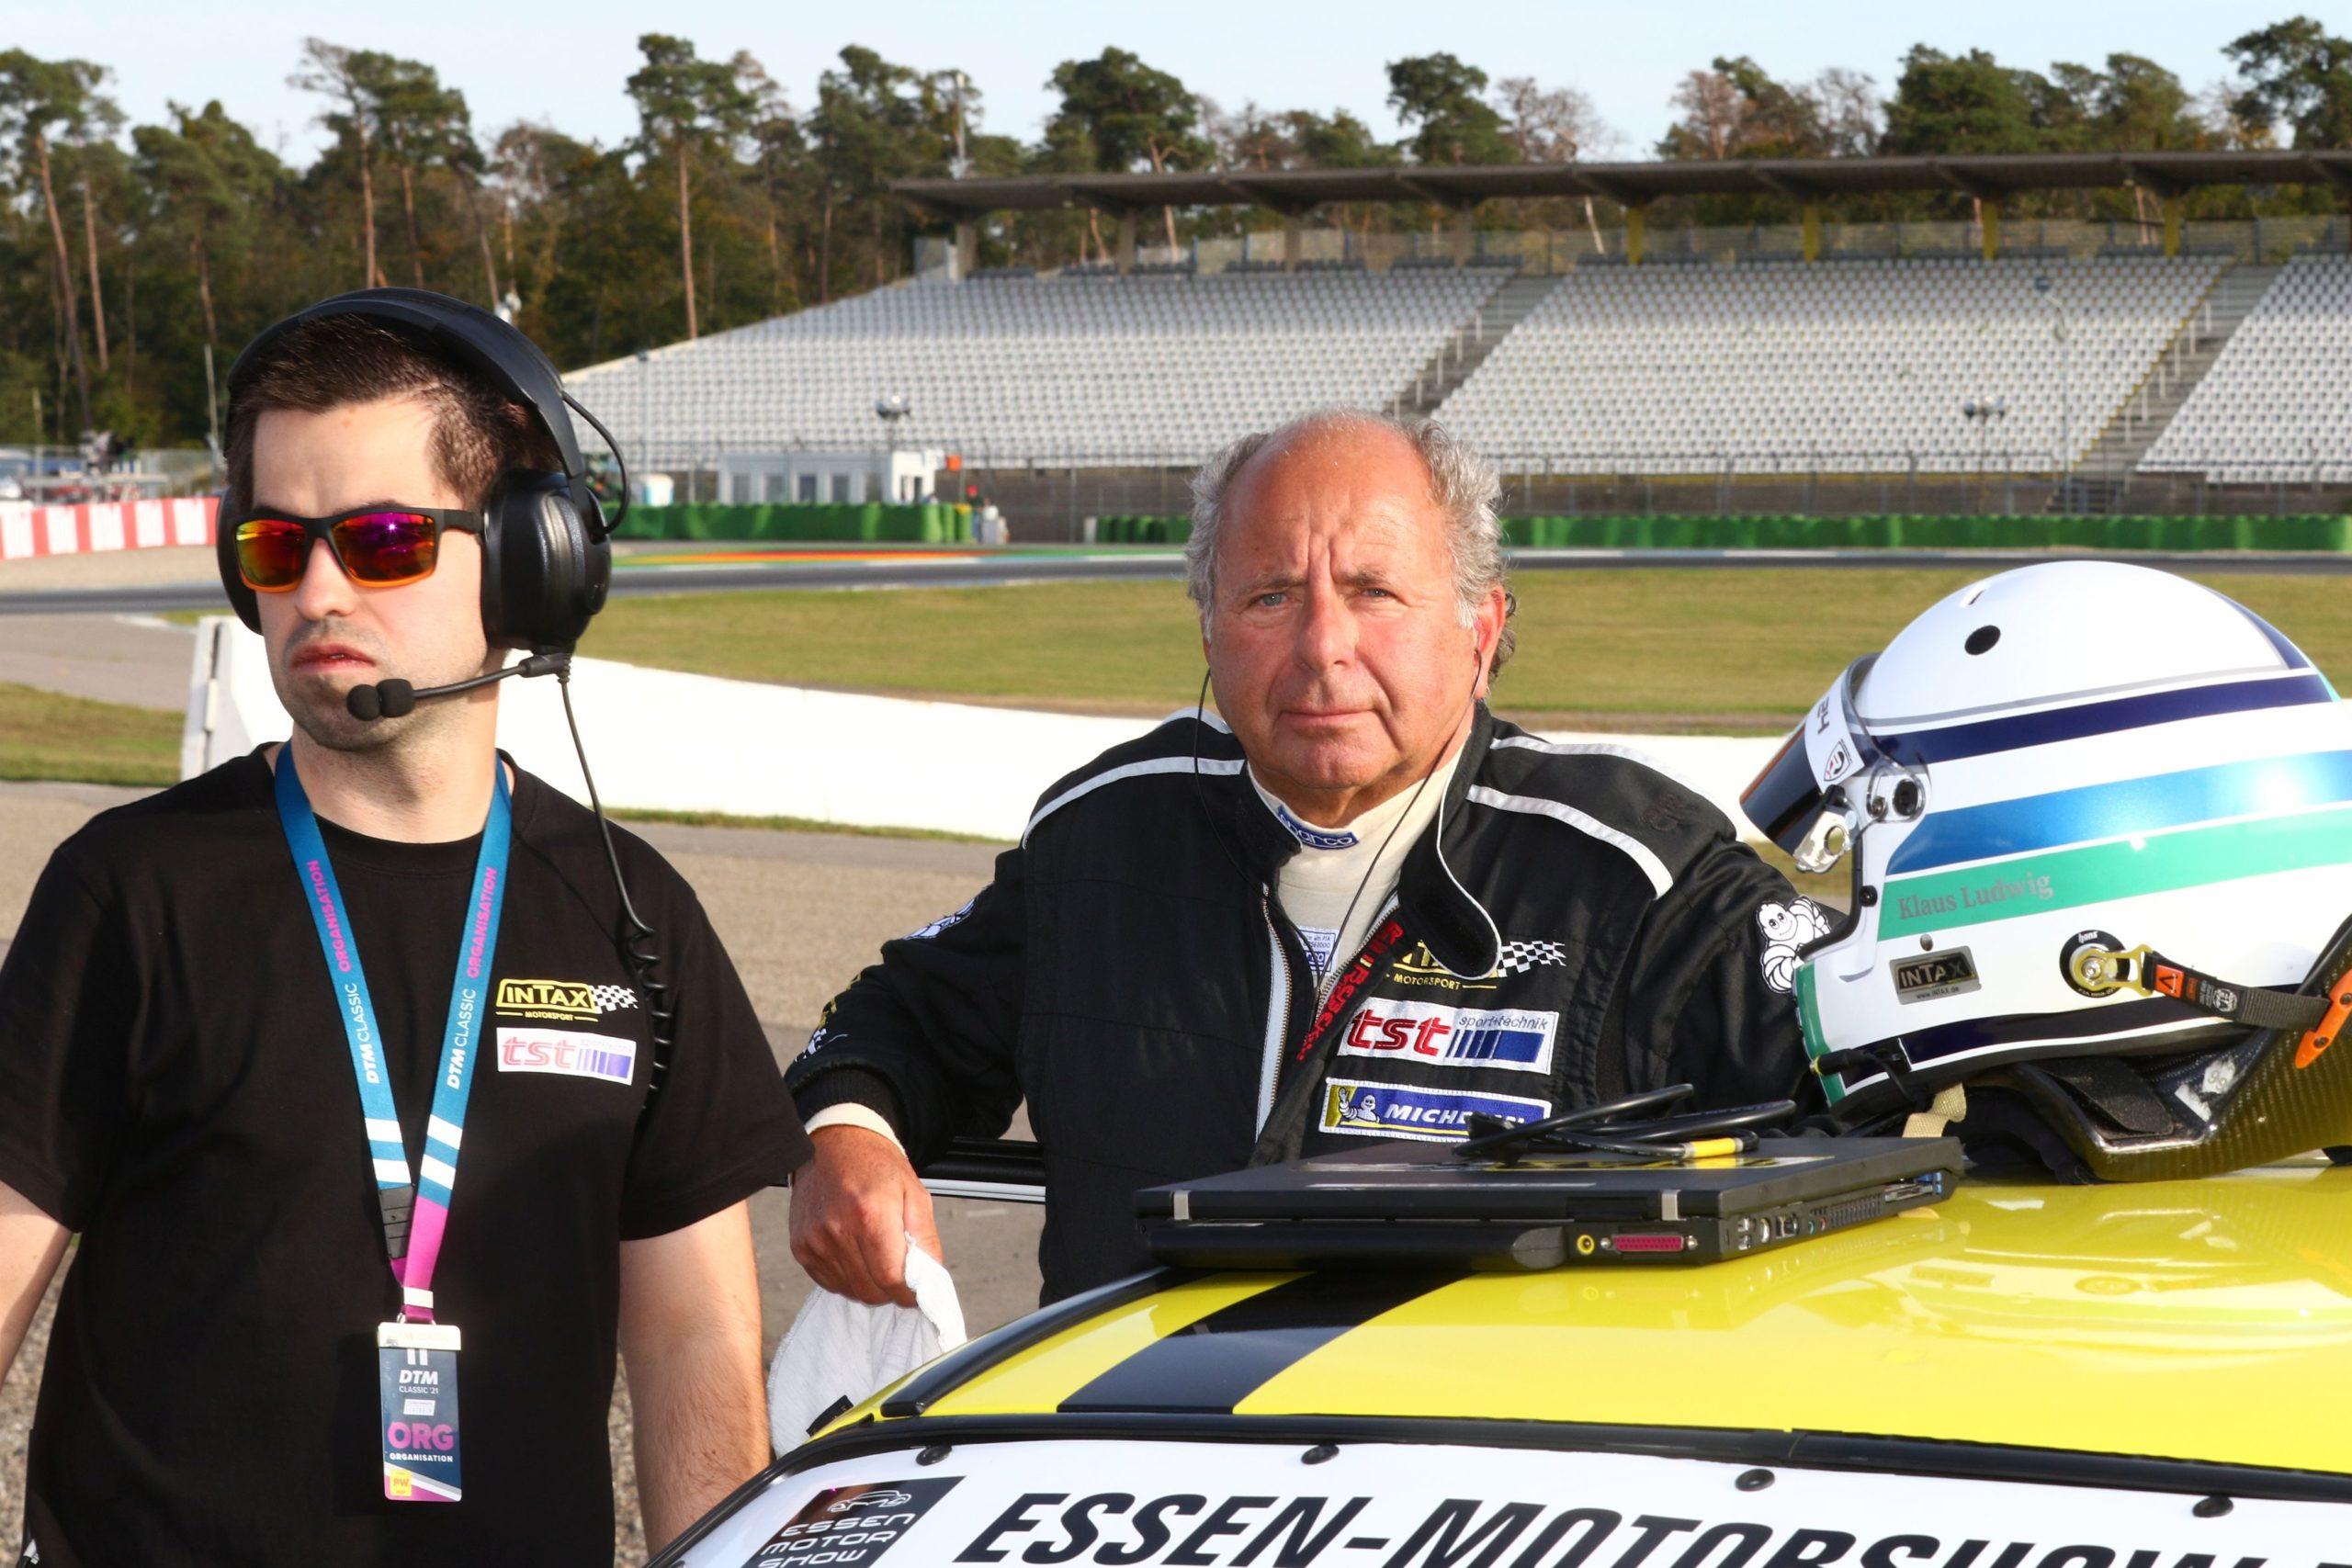 DTM-Classic-tst-sport-und-technik-Mercedes-Benz-Klaus-Ludwig-2128186